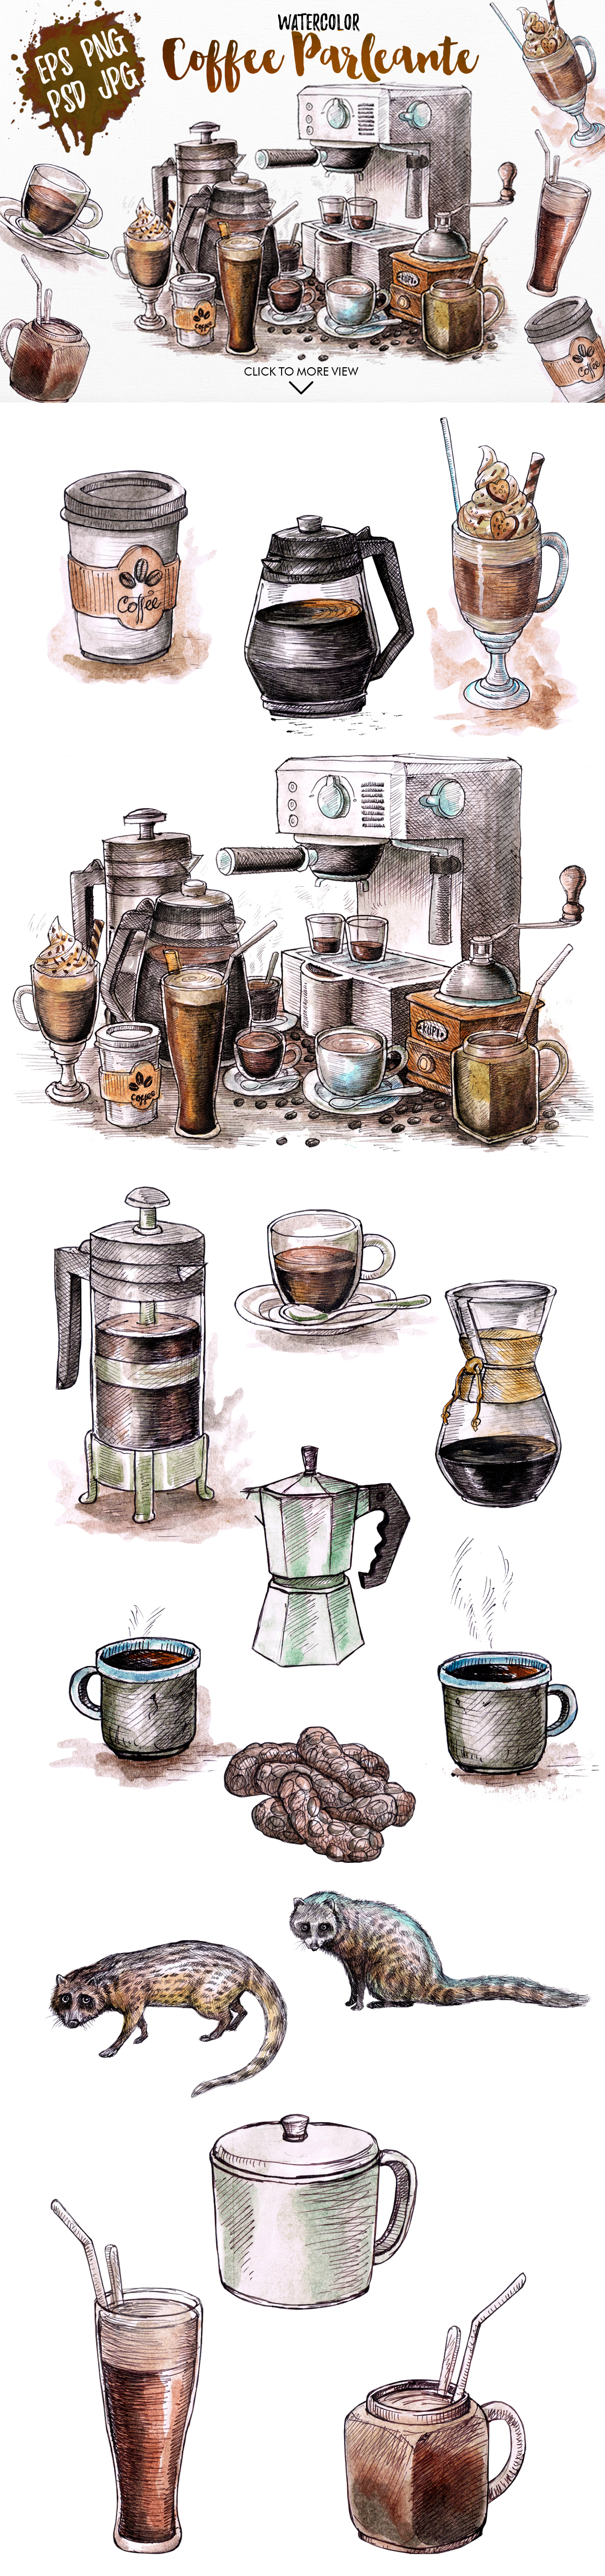 Watercolor Coffee Black Parleante example image 3